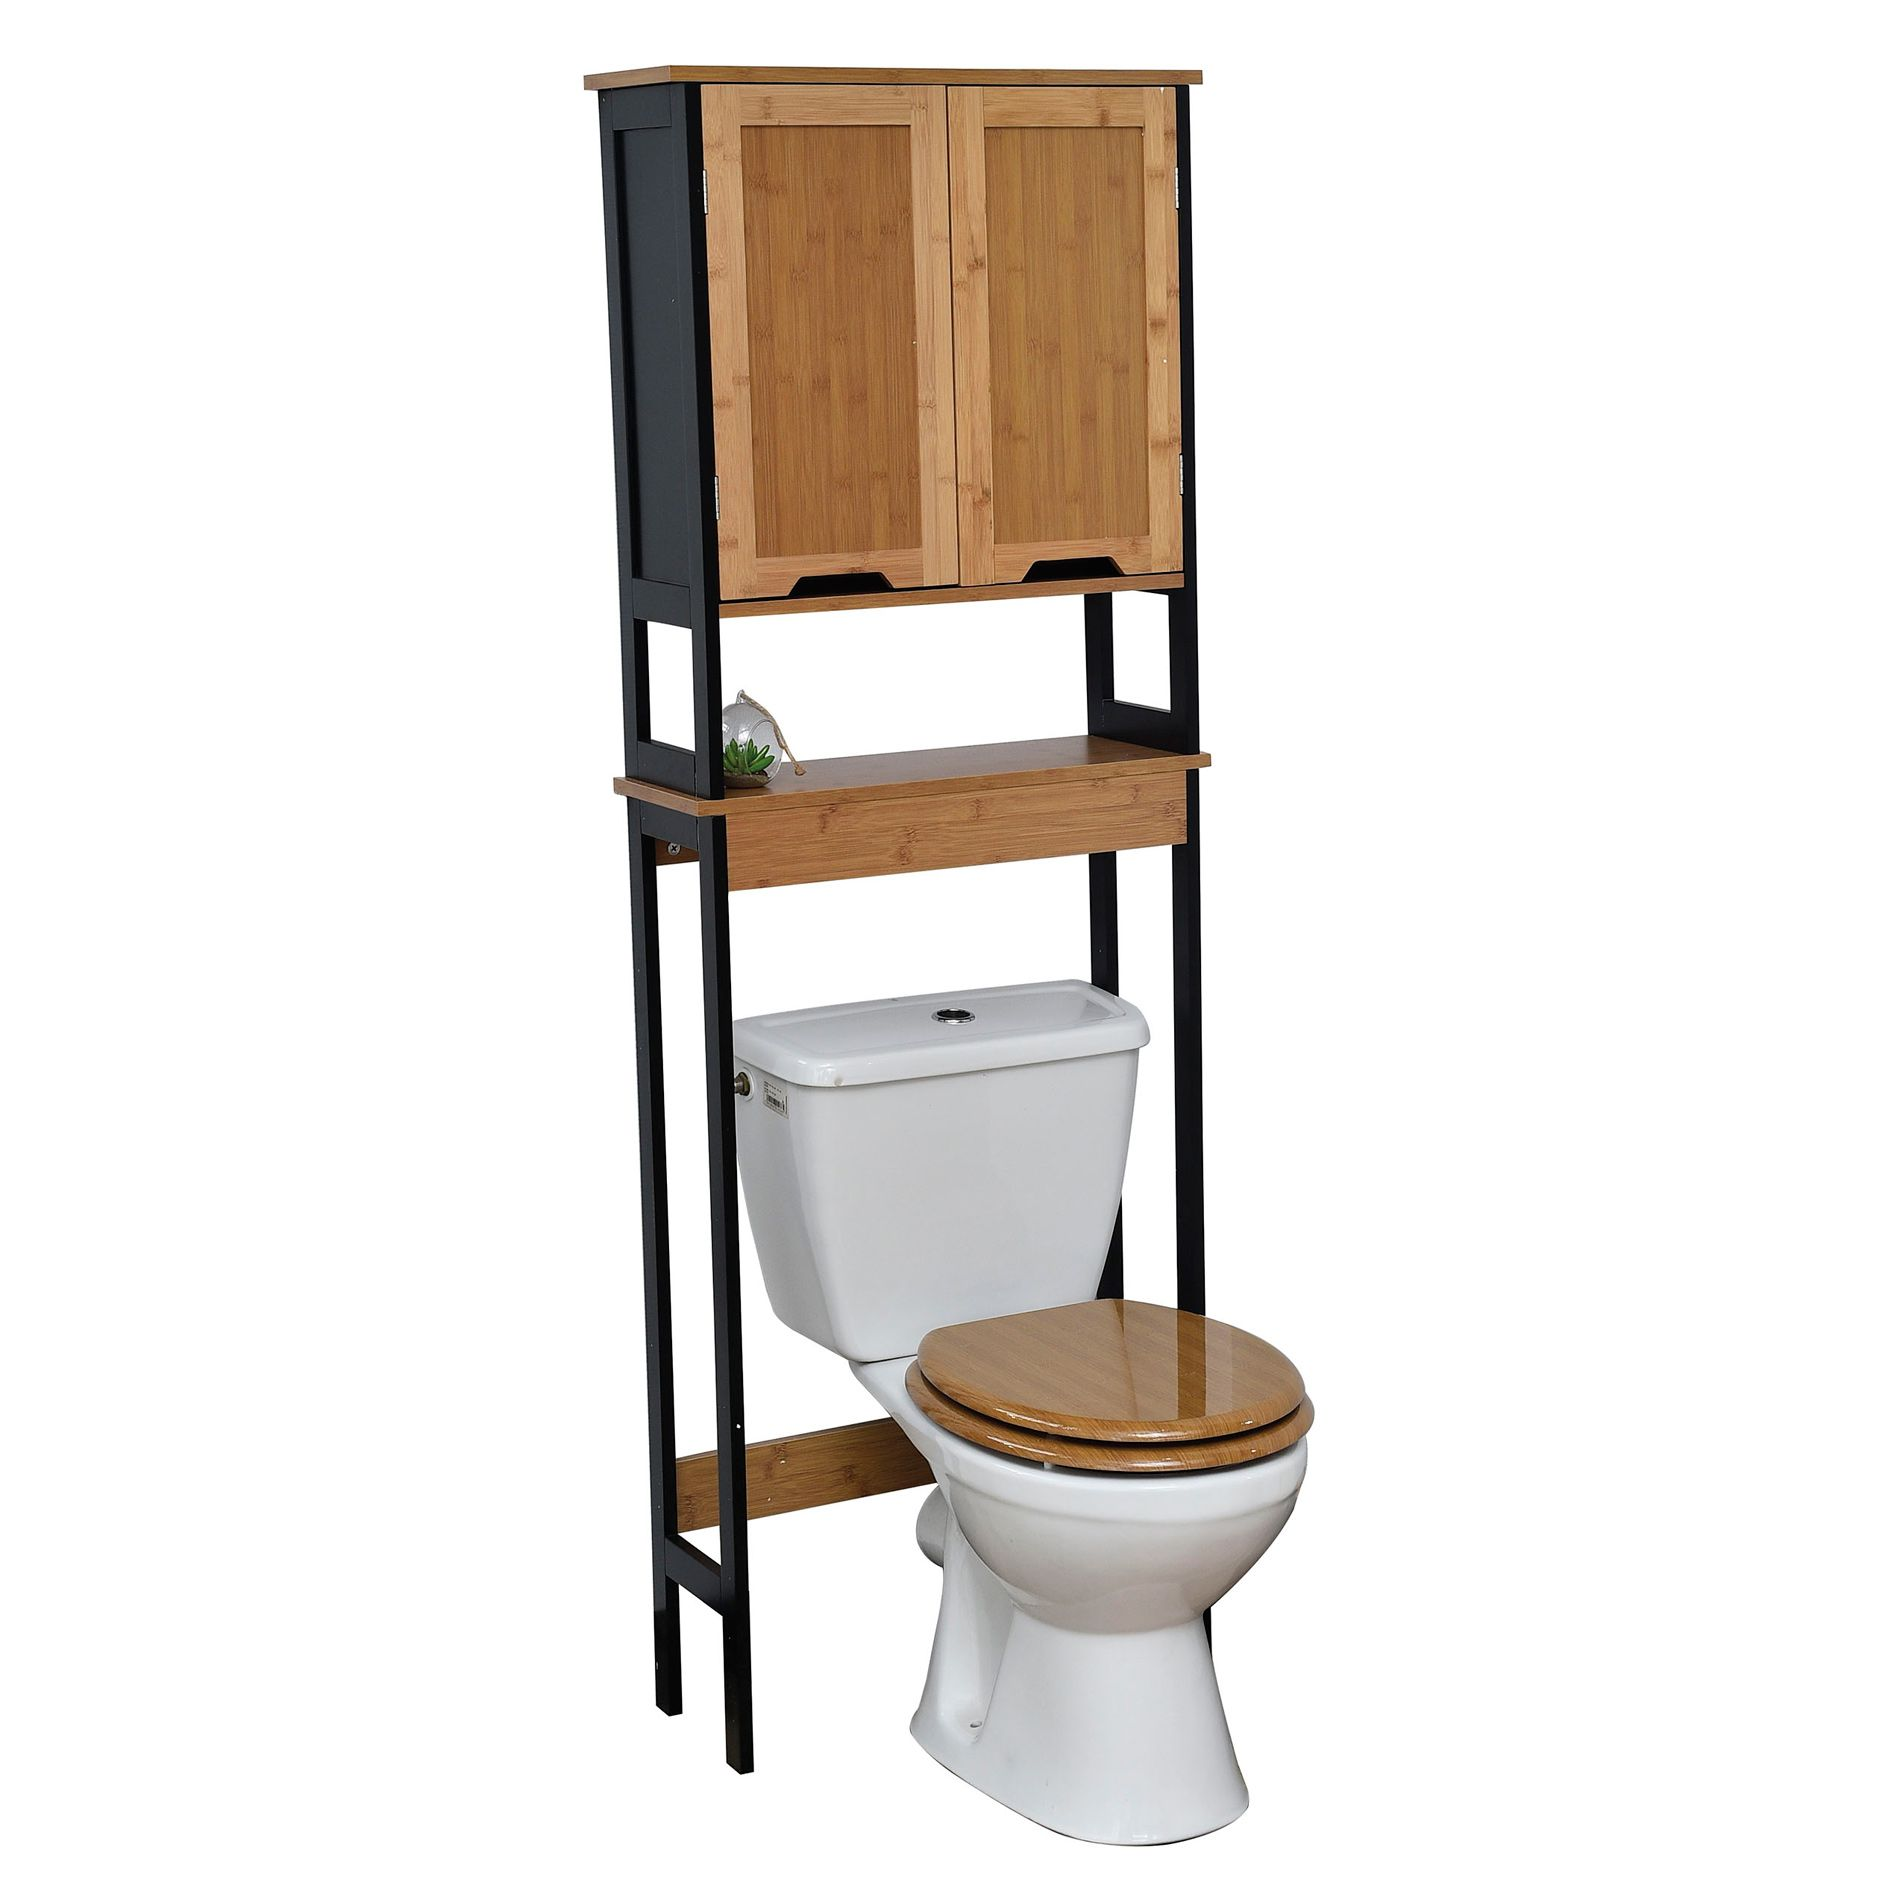 meuble dessus wc phuket bambou et noir dessus wc eminza. Black Bedroom Furniture Sets. Home Design Ideas